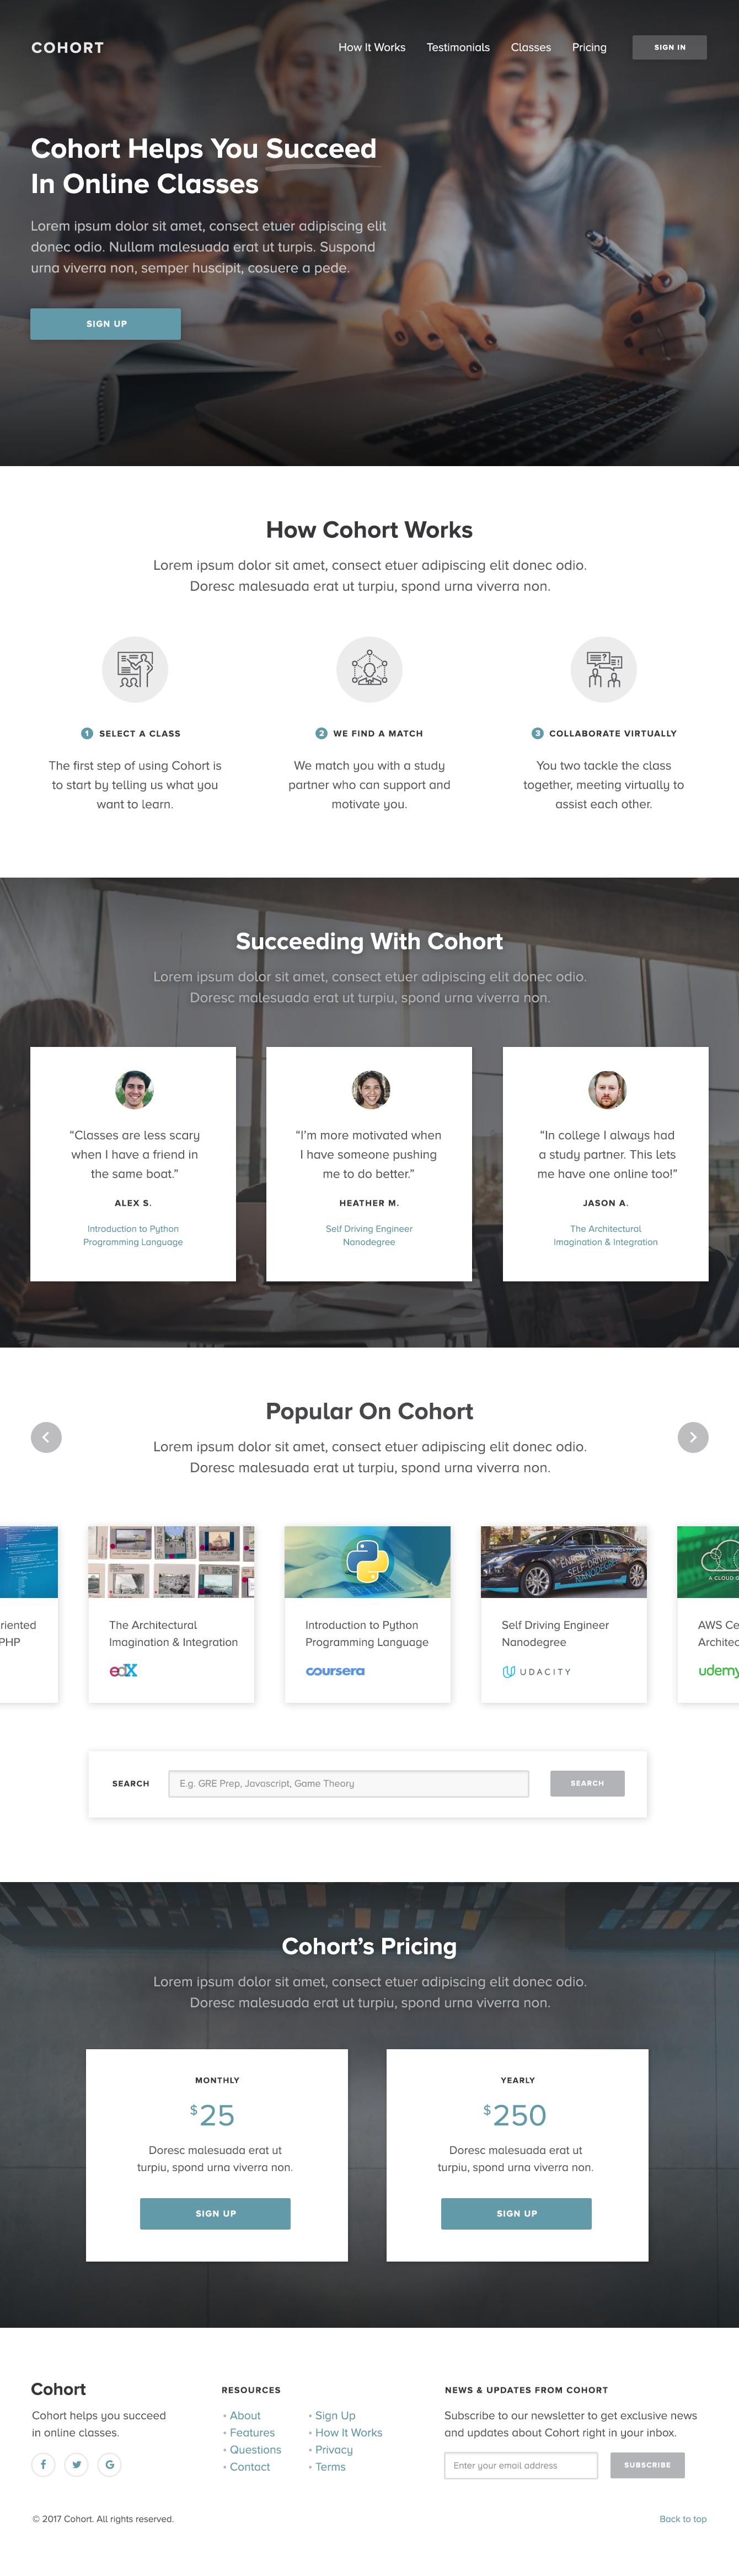 Cohort homepage